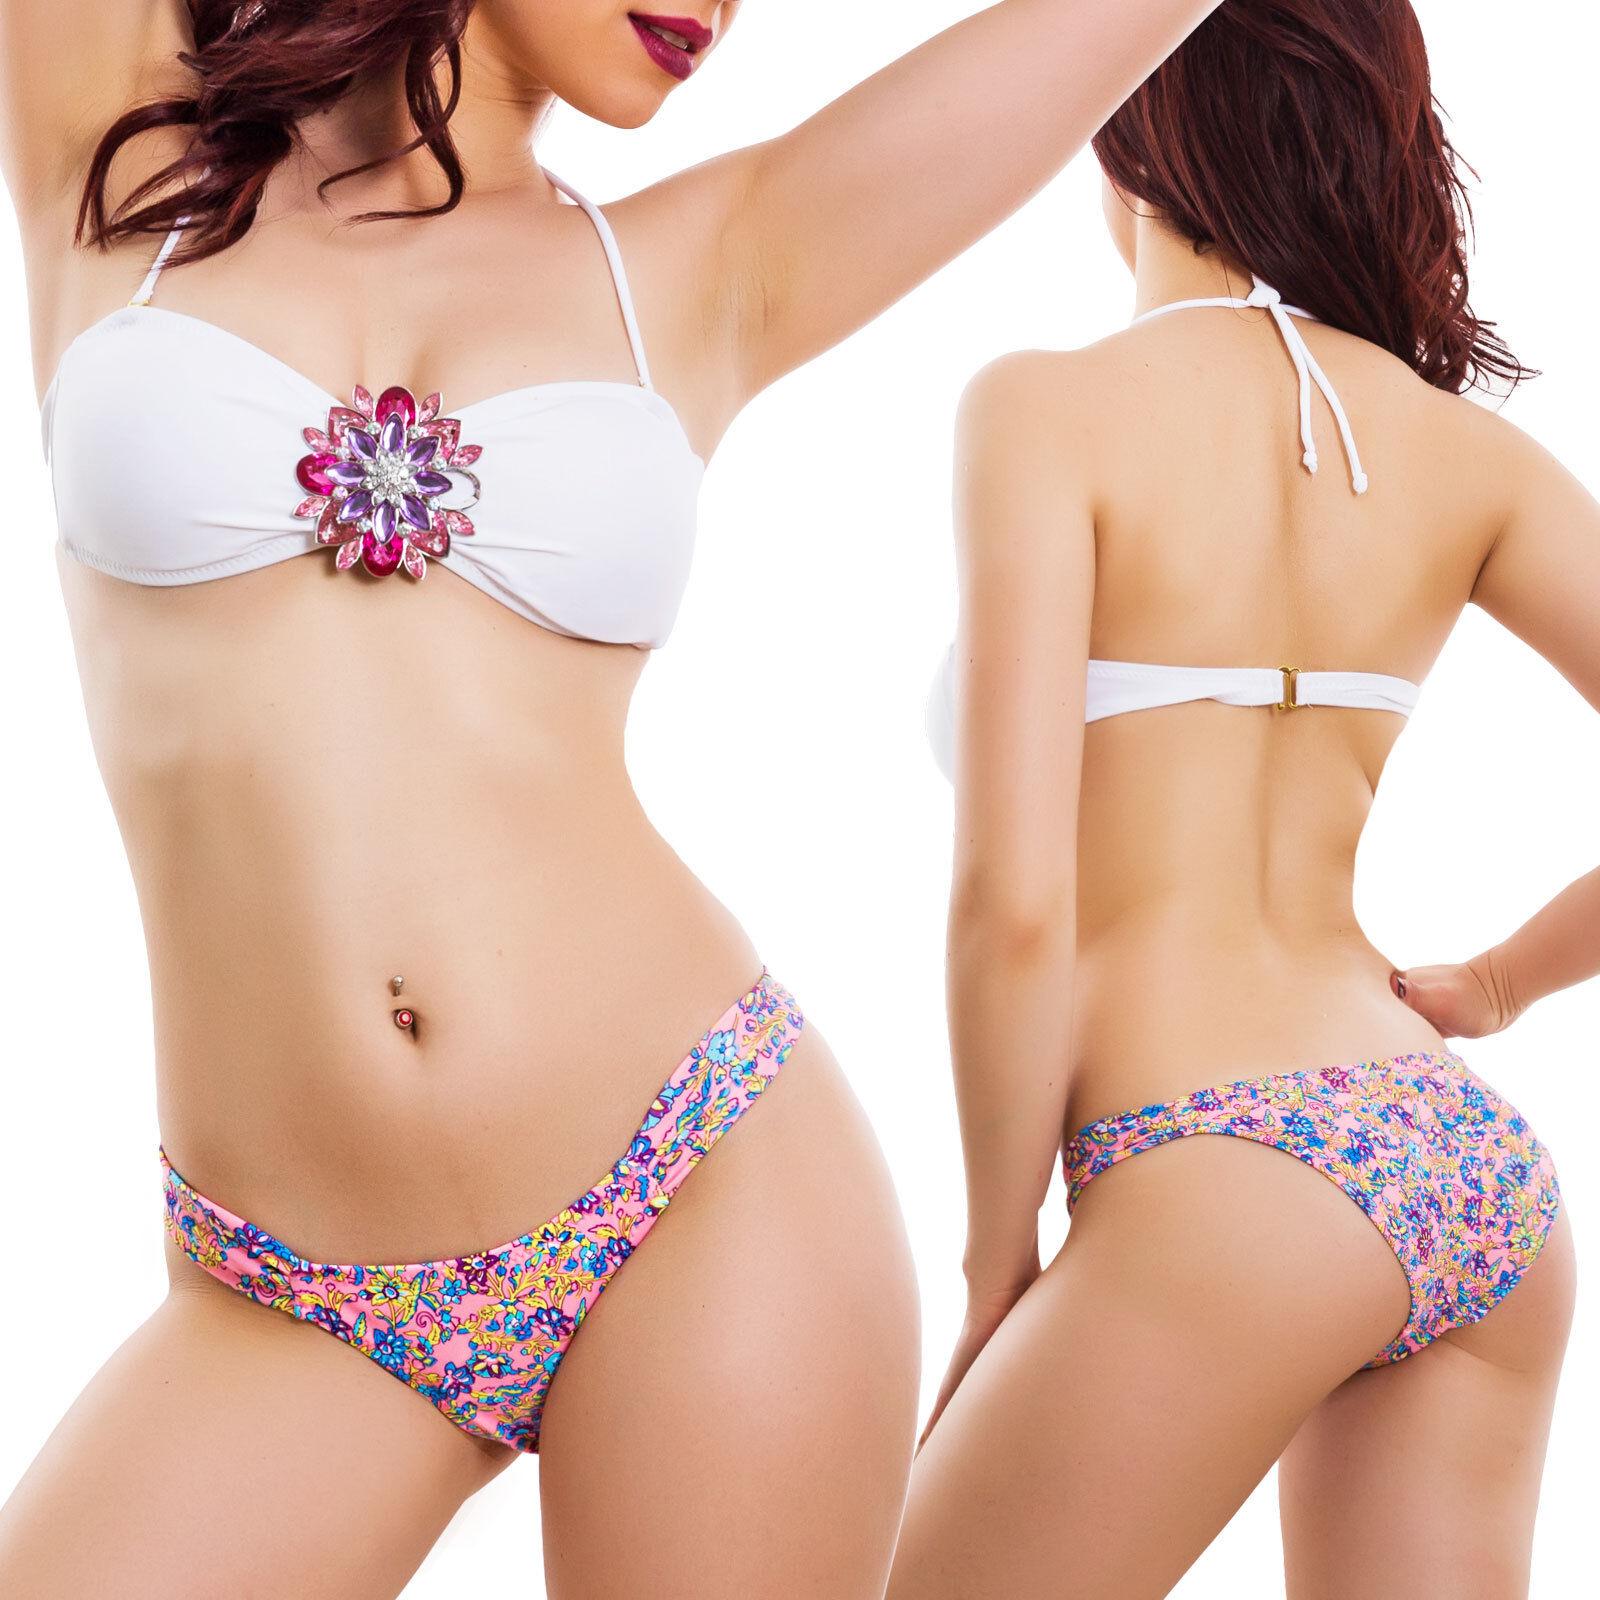 dfcb04a8fb60 Detalles de Bikini Mujer Traje Mar Joya Banda Dos Piezas Moda Mar Sexy  DL-1006